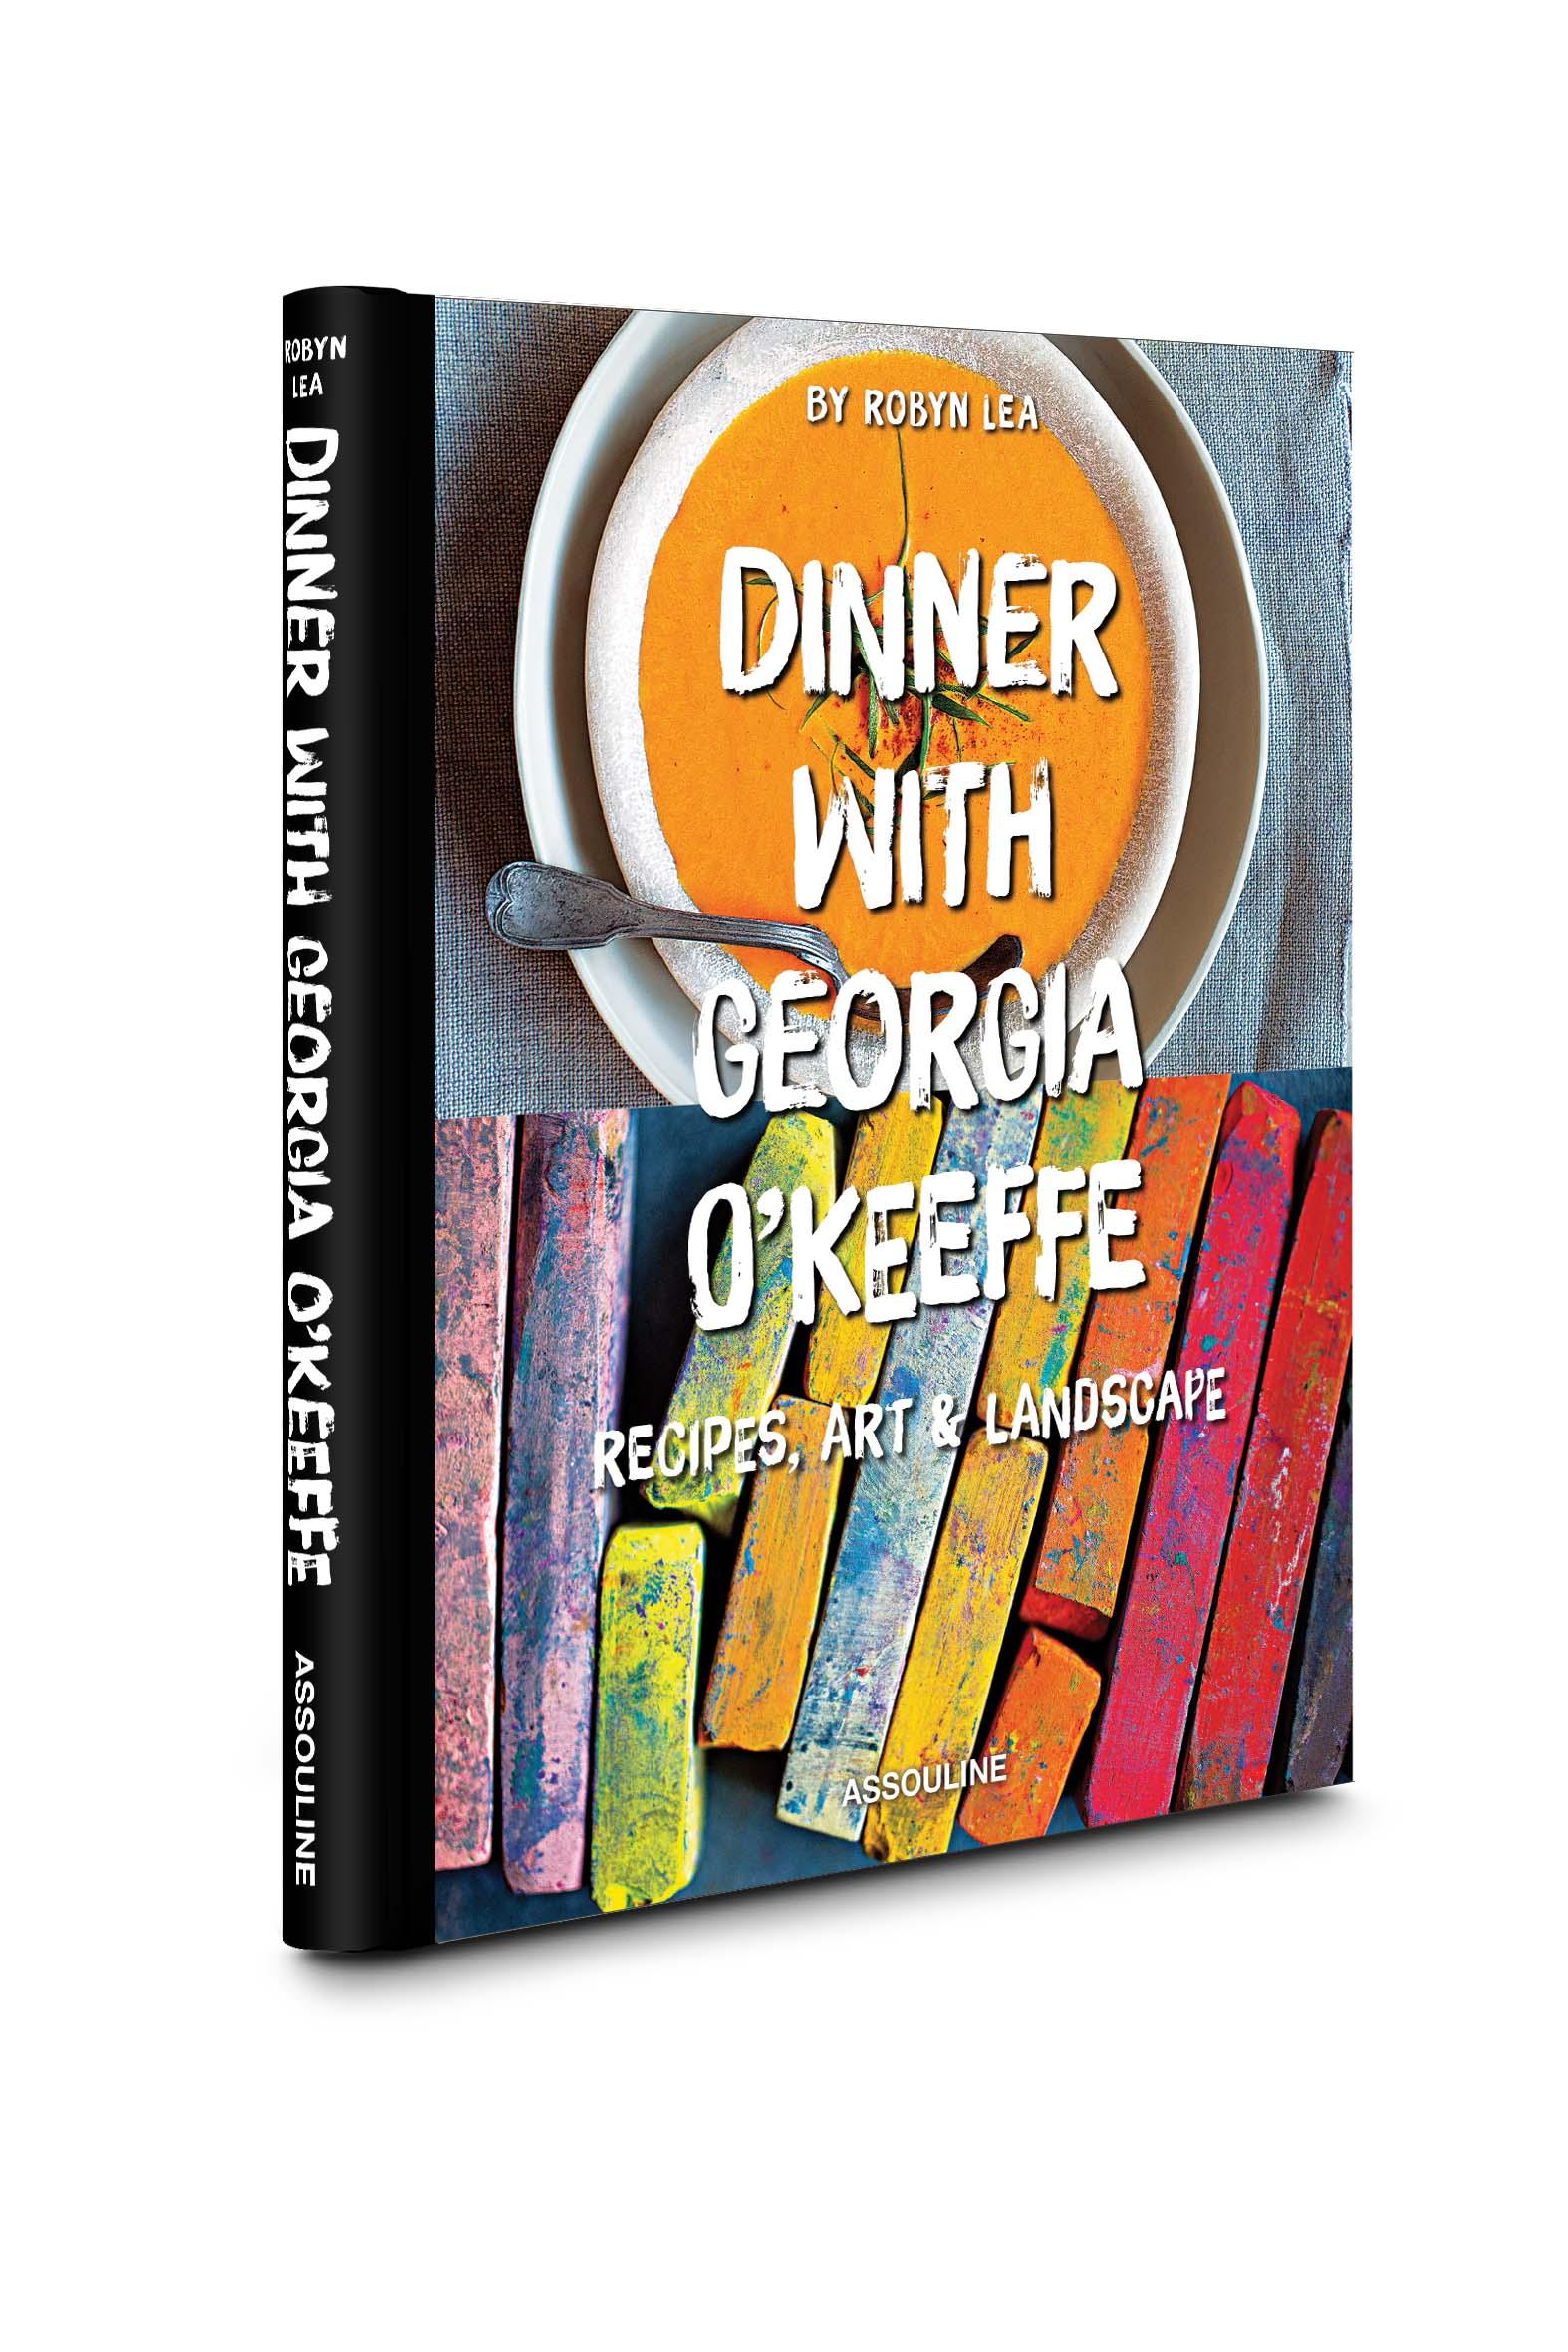 Dinner with Georgia O'Keeffe - 3D Cover.jpg